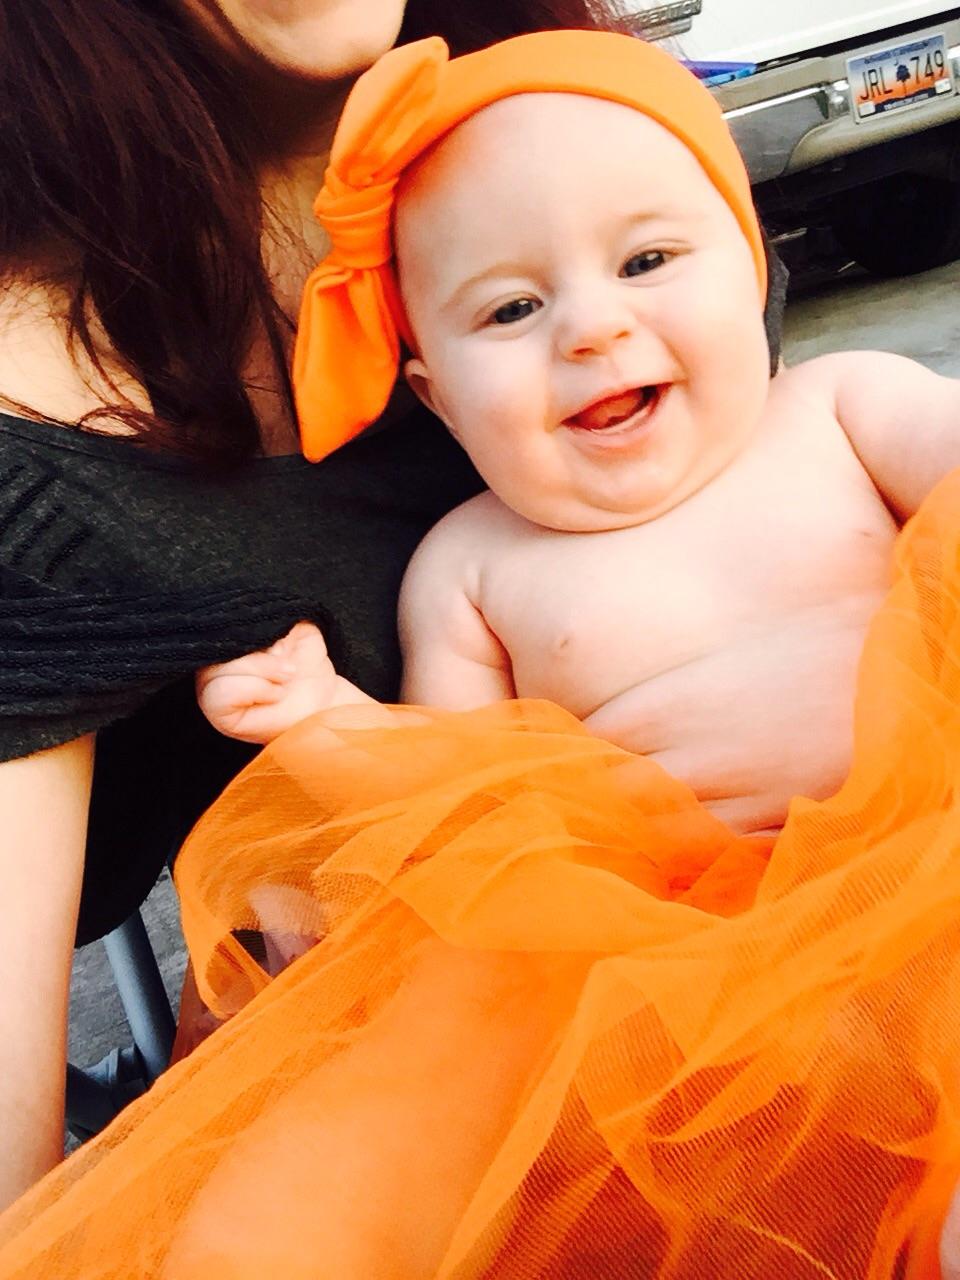 Pumpkin Princess greeting her trick-or-treaters!